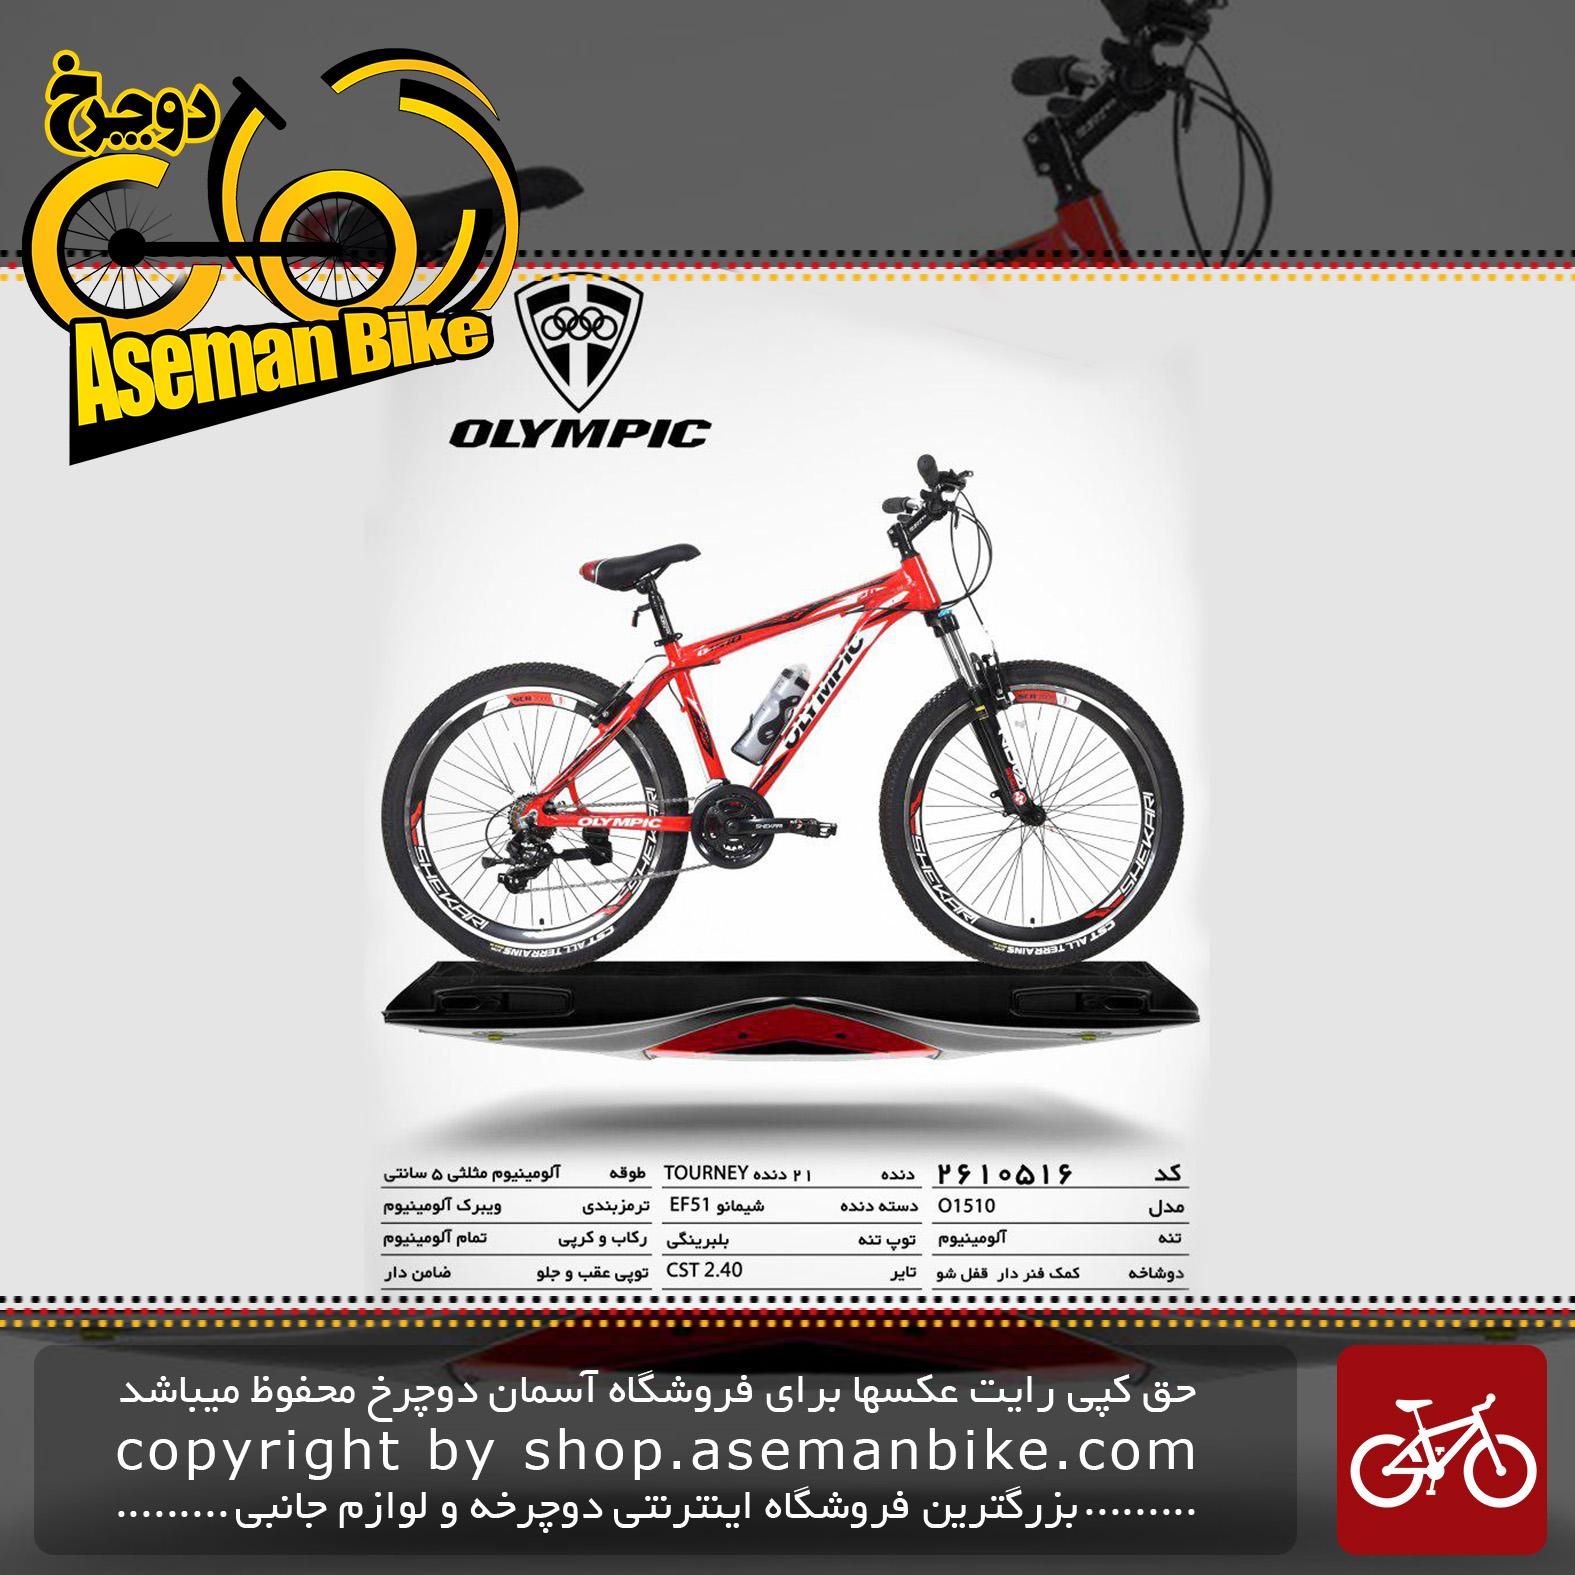 دوچرخه کوهستان شهری المپیک 21 دنده مدل او 1510 سایز 26 ساخت تایوان OLYMPIC Mountain City Bicycle Taiwan O1510 Size 26 2019